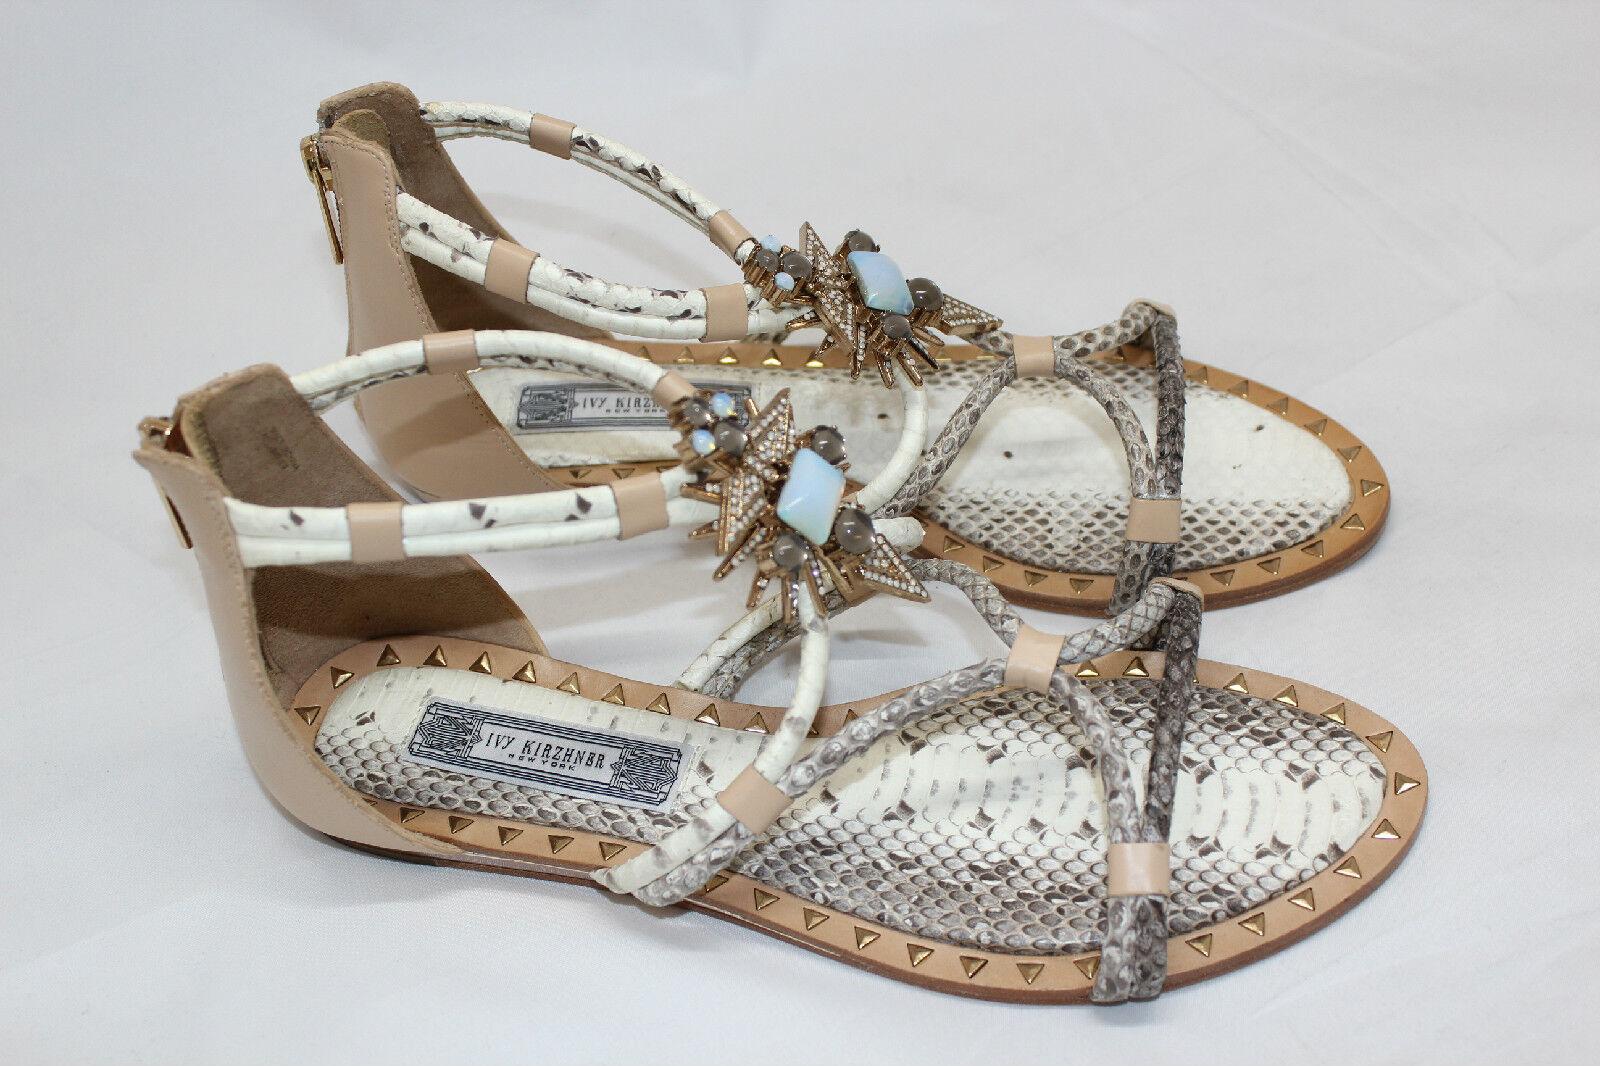 Ivy  Kirzhner Basil Snakeskin Sandals Gladiator Strap Cabochon Crystals 10M (N5)  centro commerciale online integrato professionale